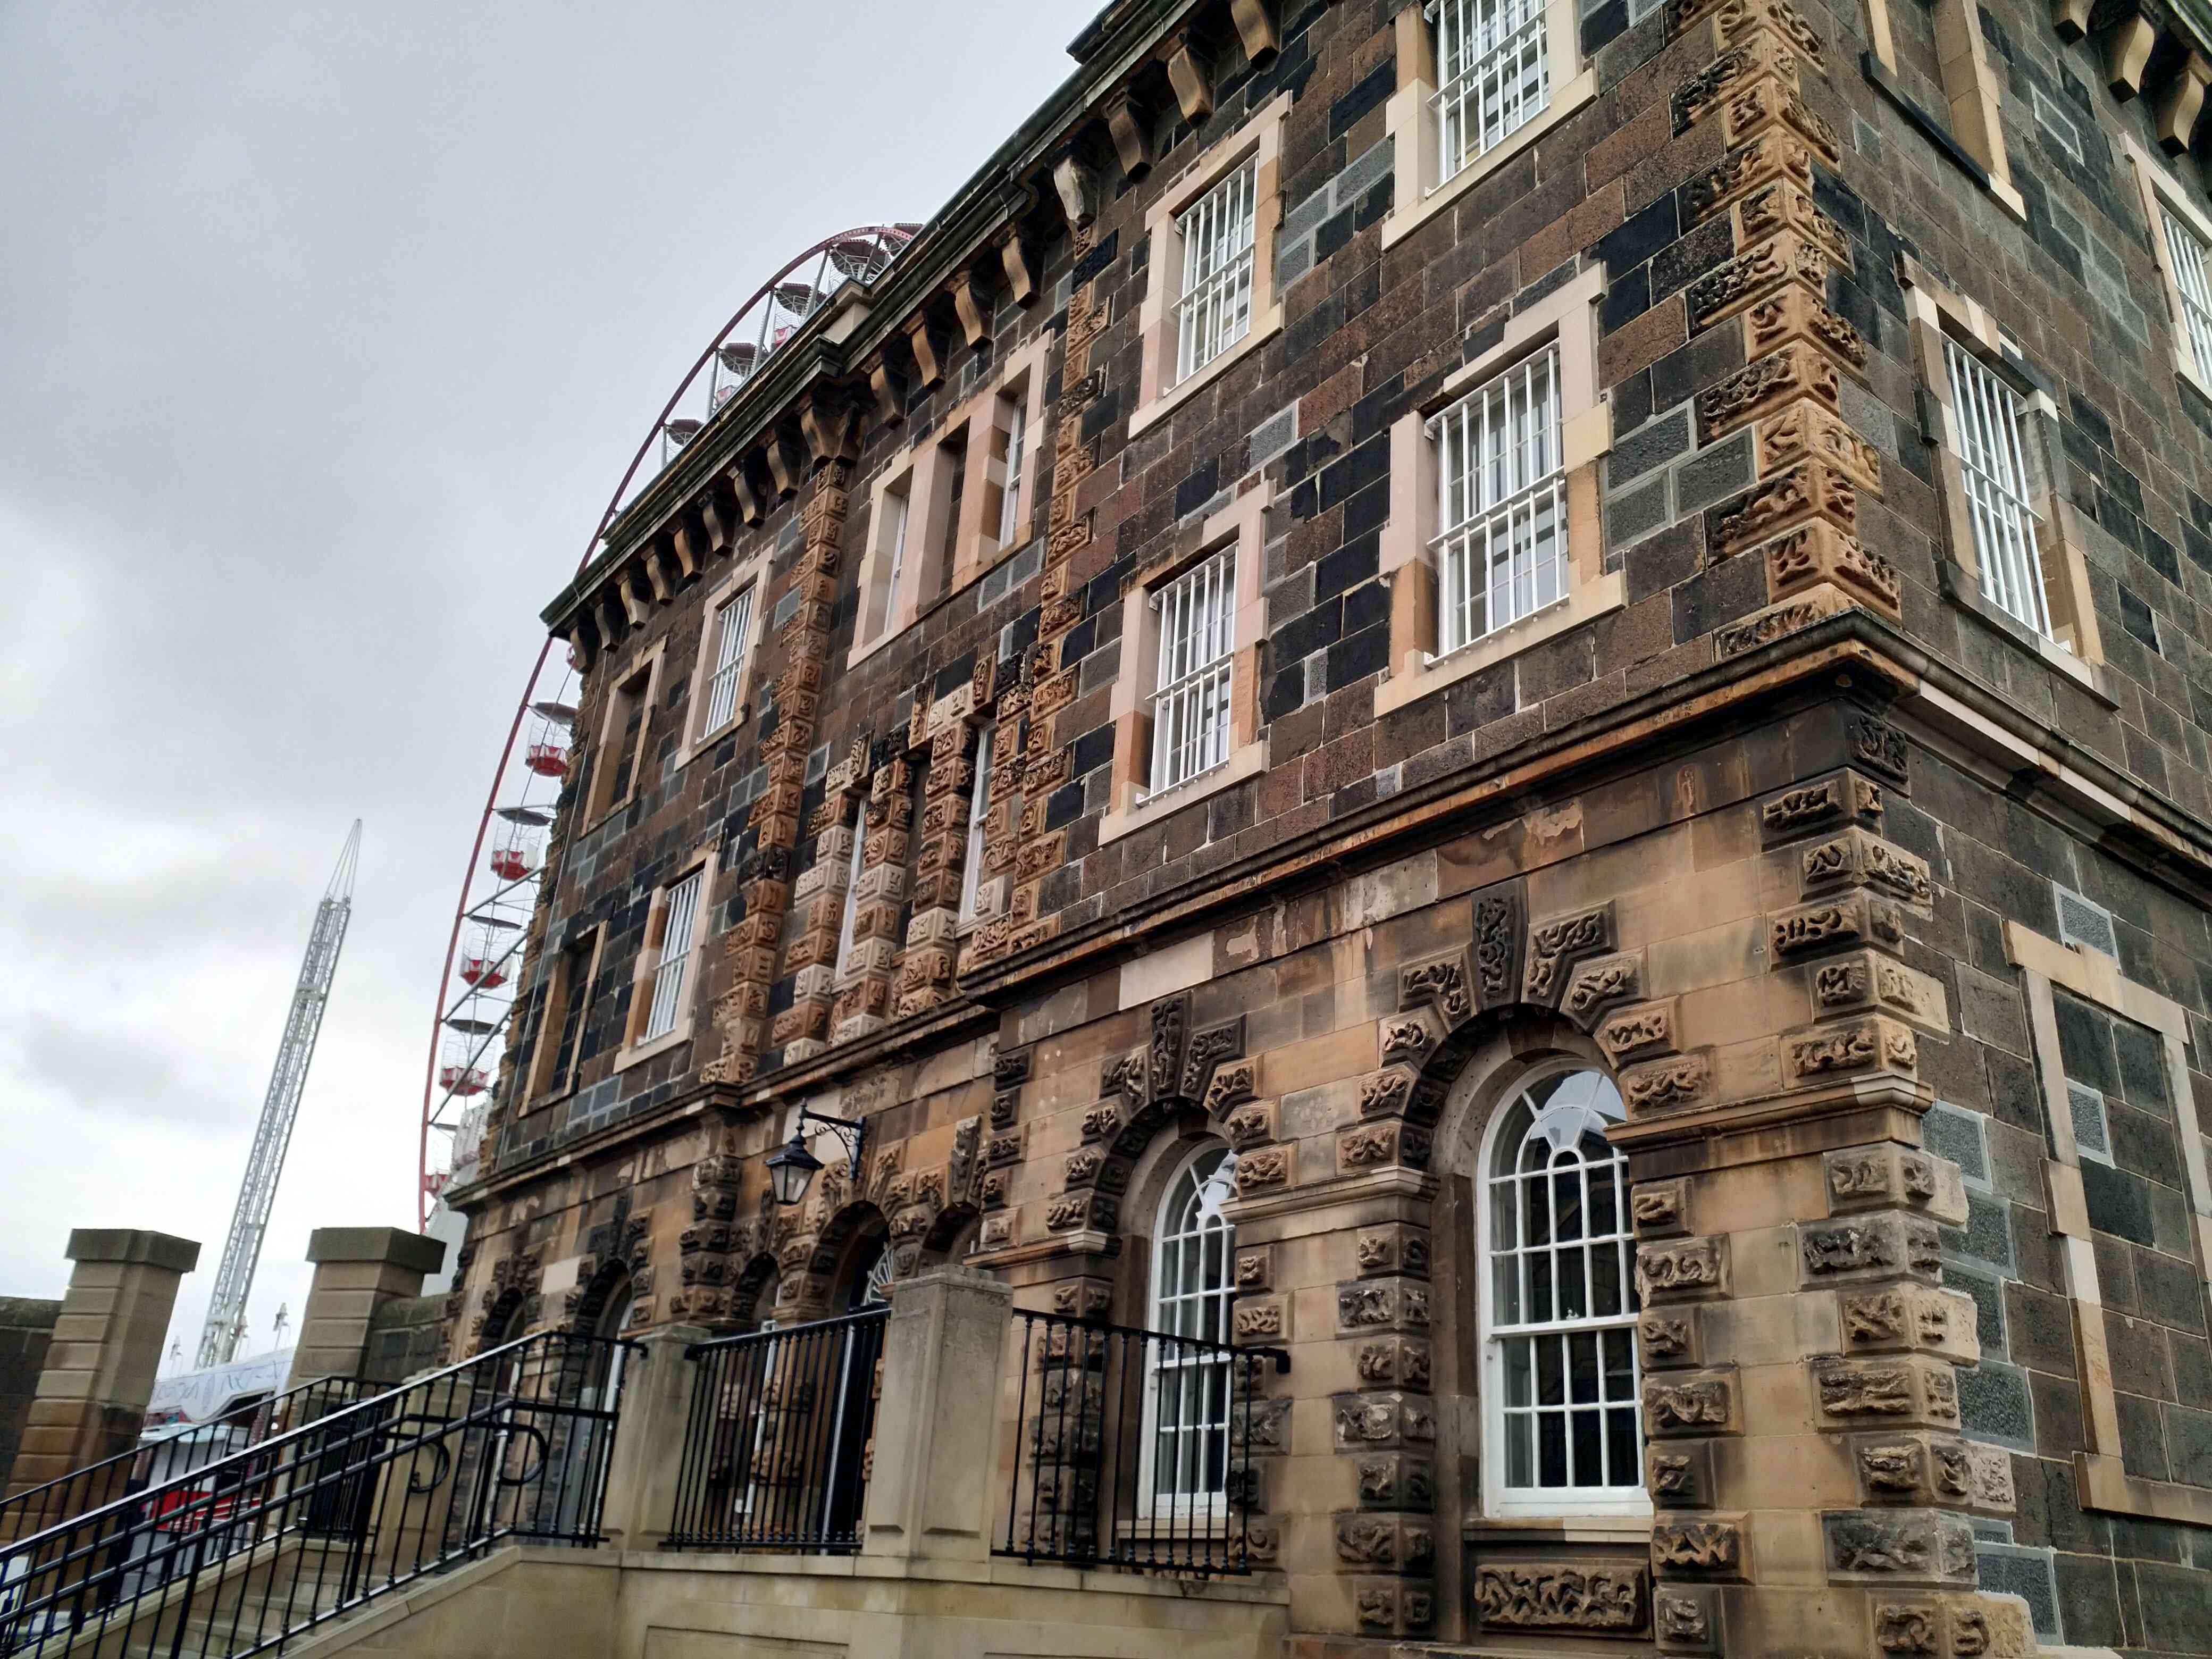 Victorian stone building